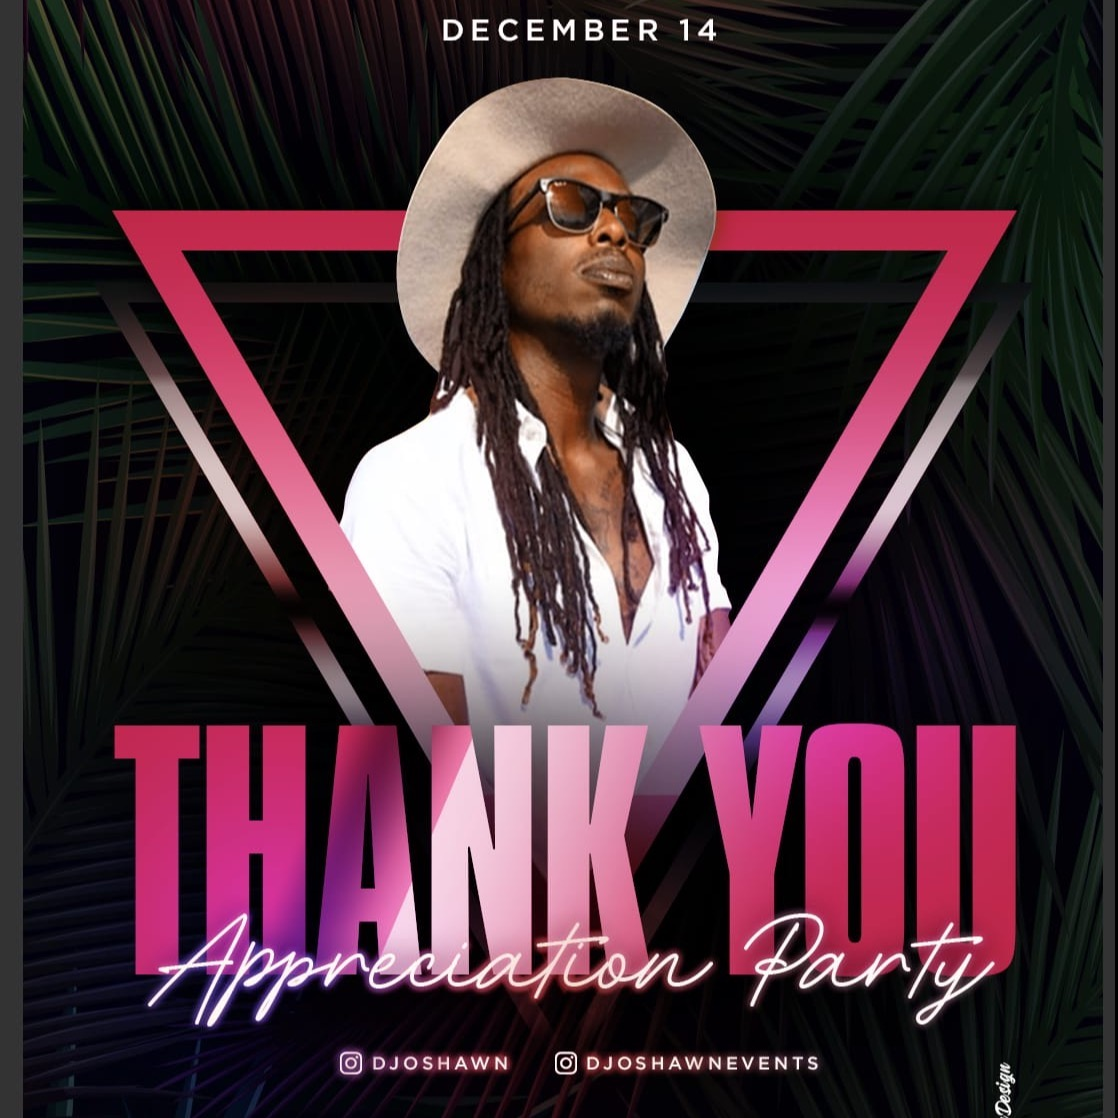 Thank You Appreciation Party